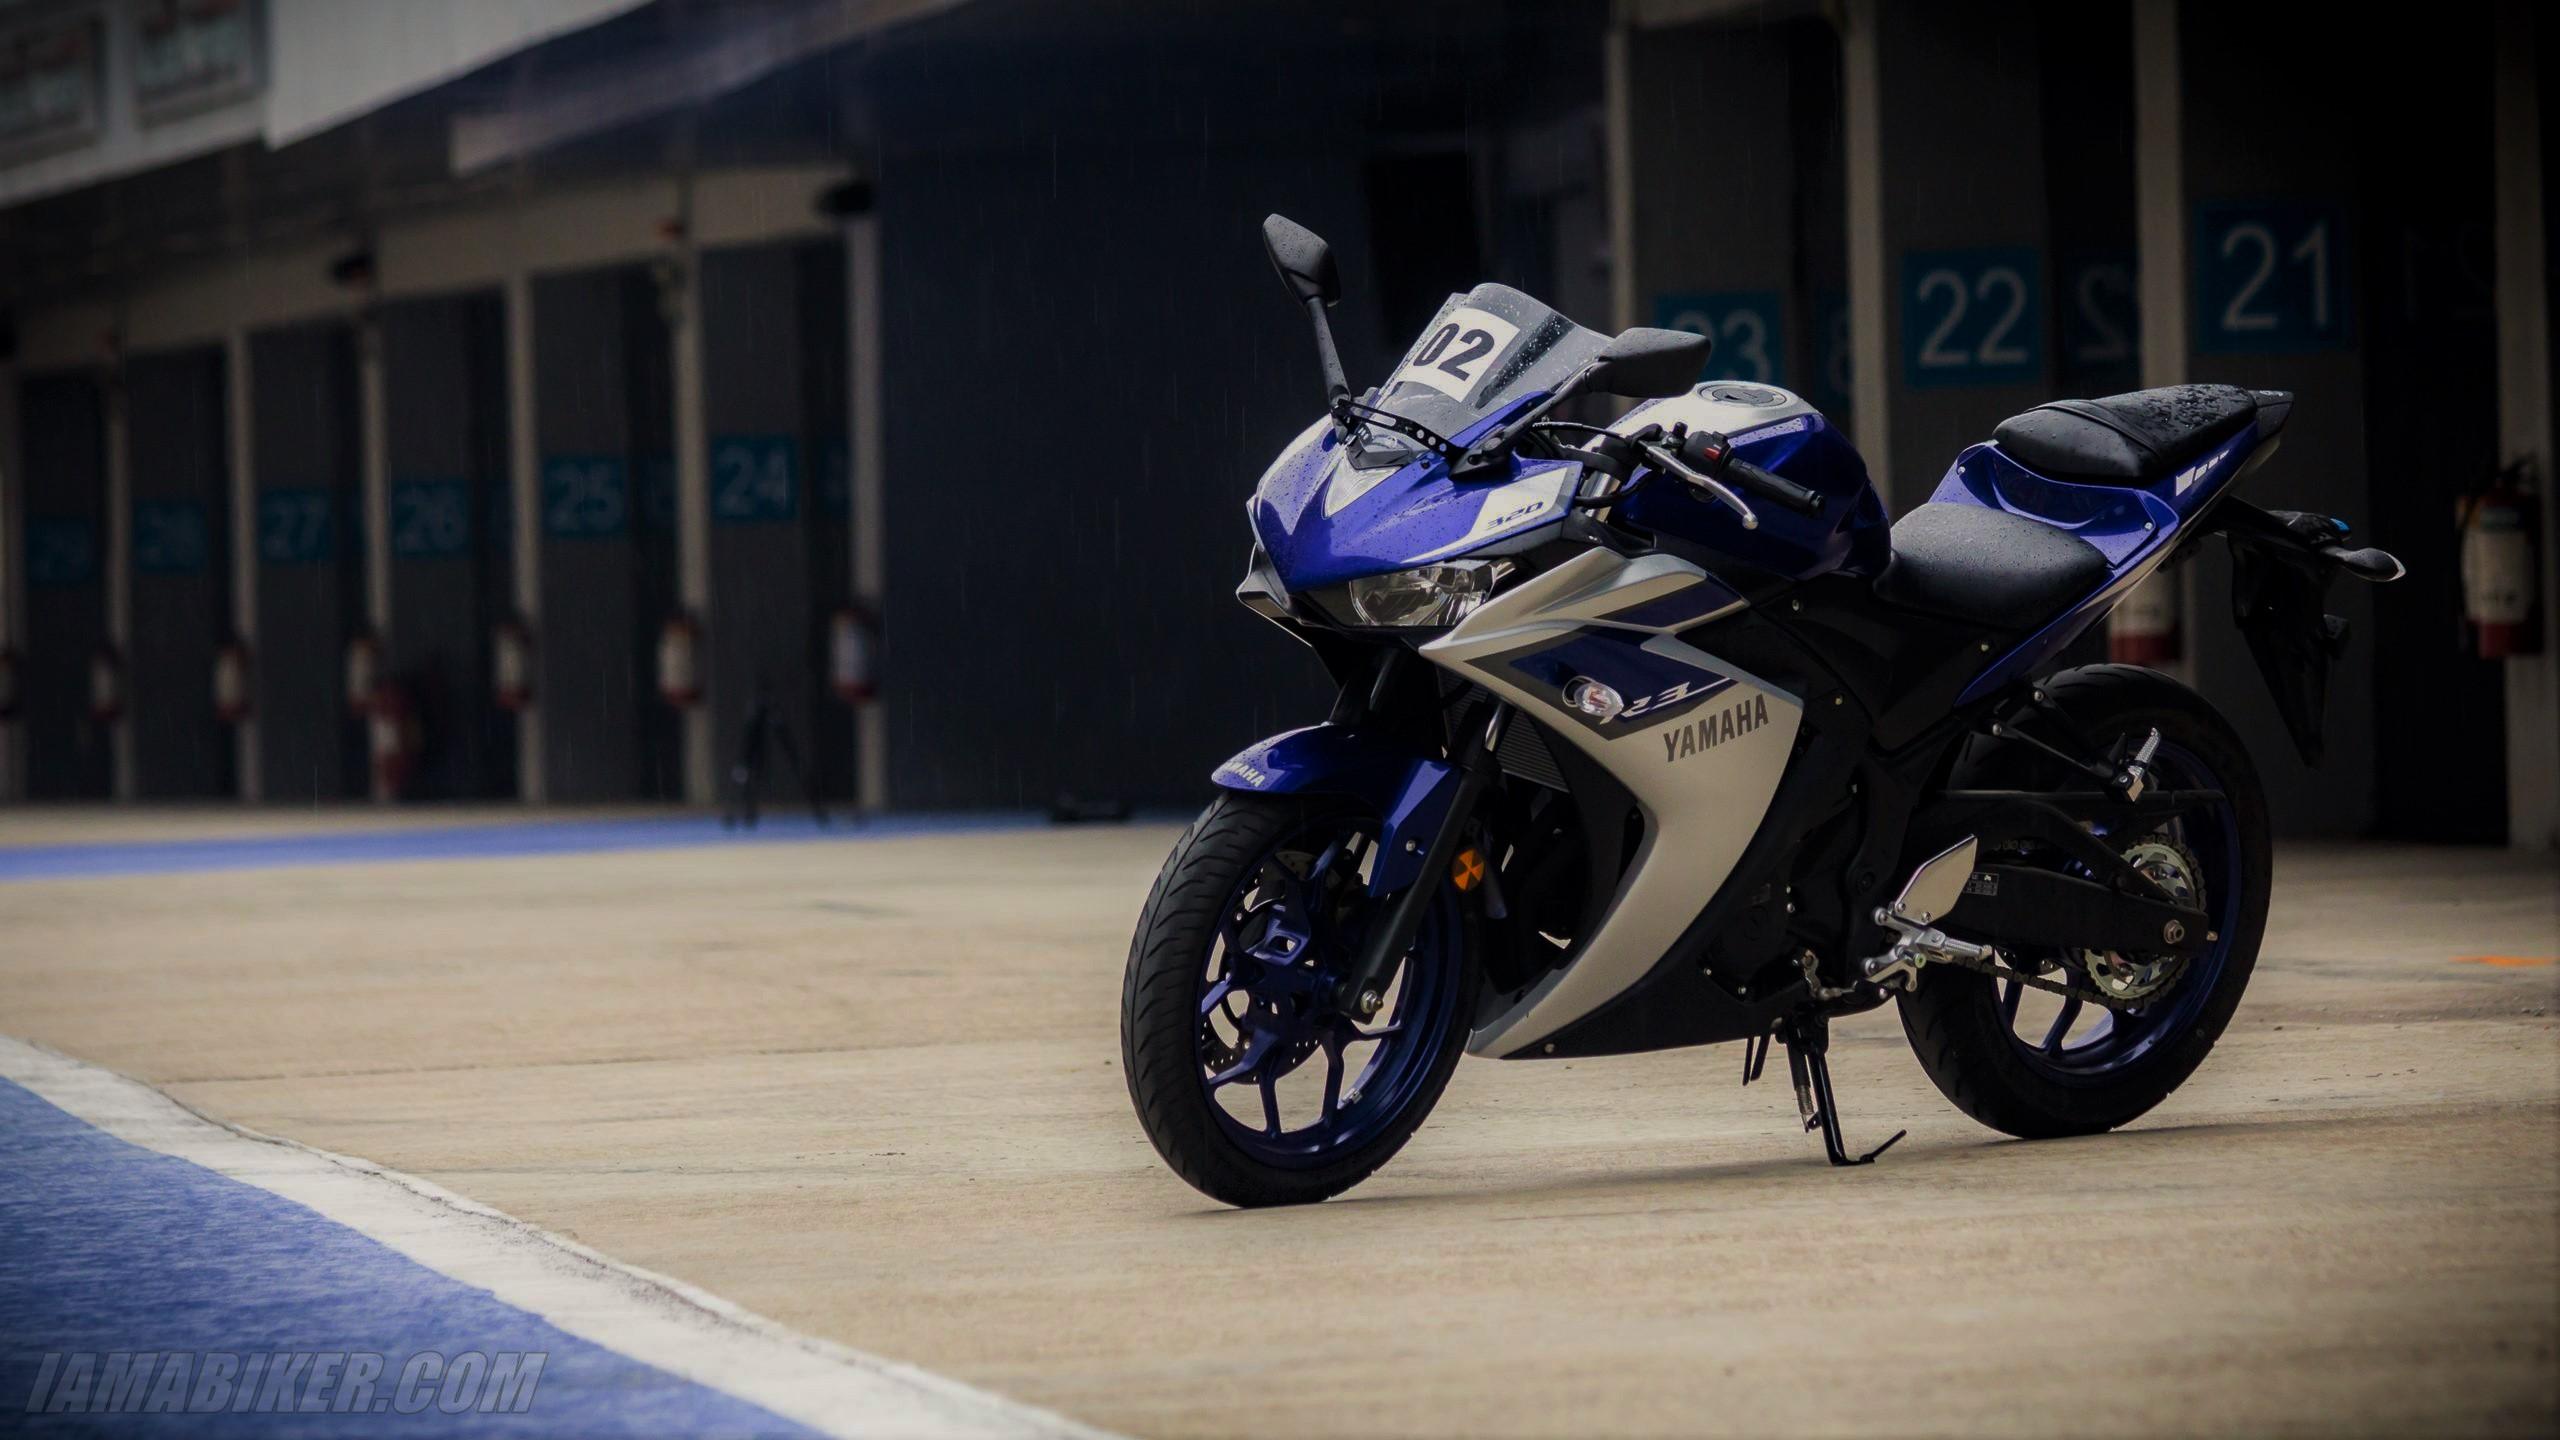 Yamaha R3 2016, HD Bikes, 4k Wallpapers, Images